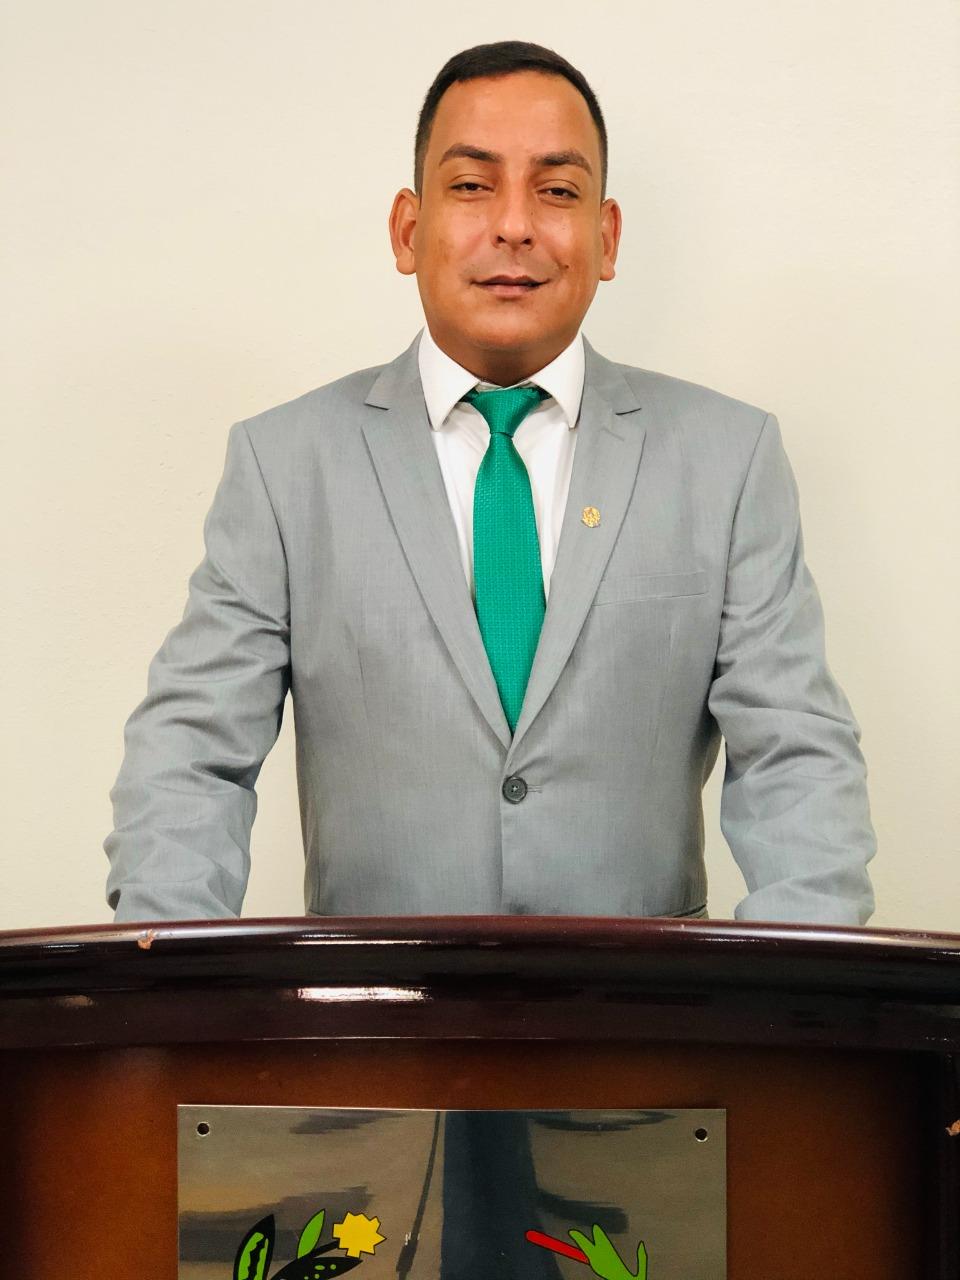 Gilberto Guerra Mendonça